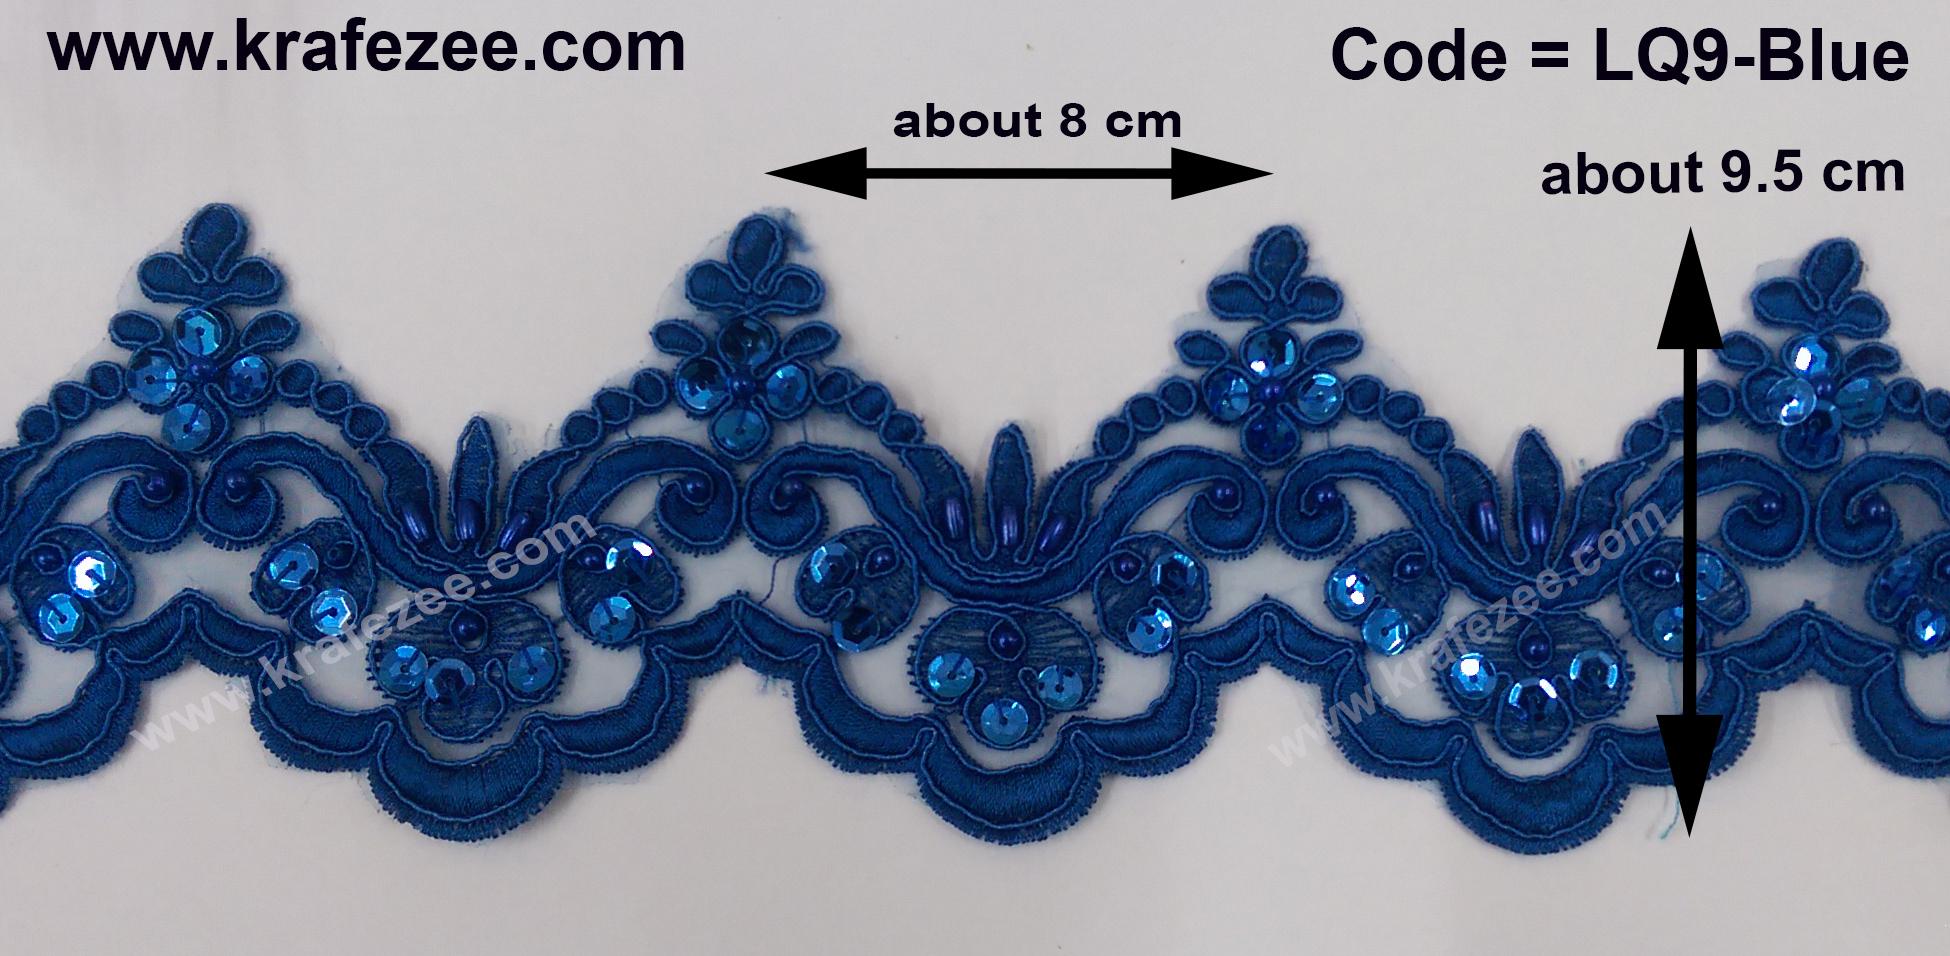 Border lace manik online dating 2